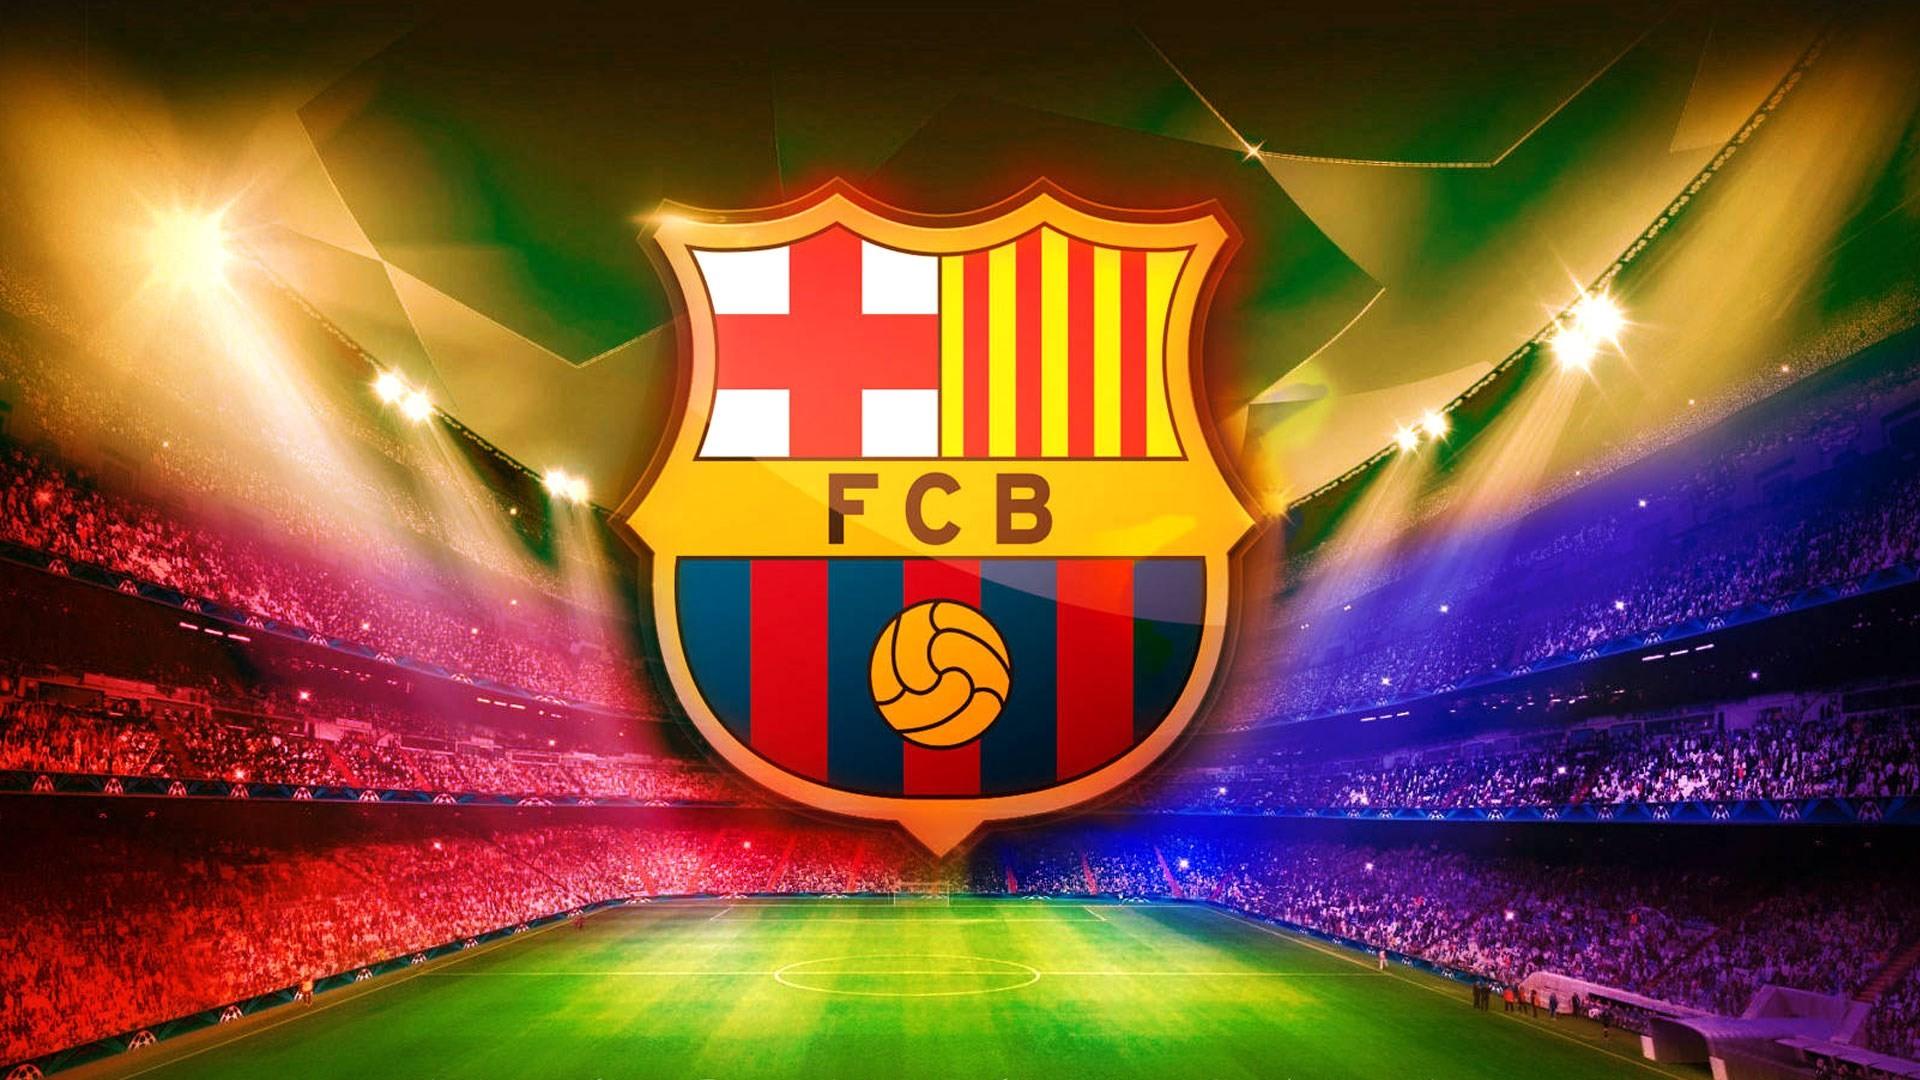 fc barcelona wallpaper 74